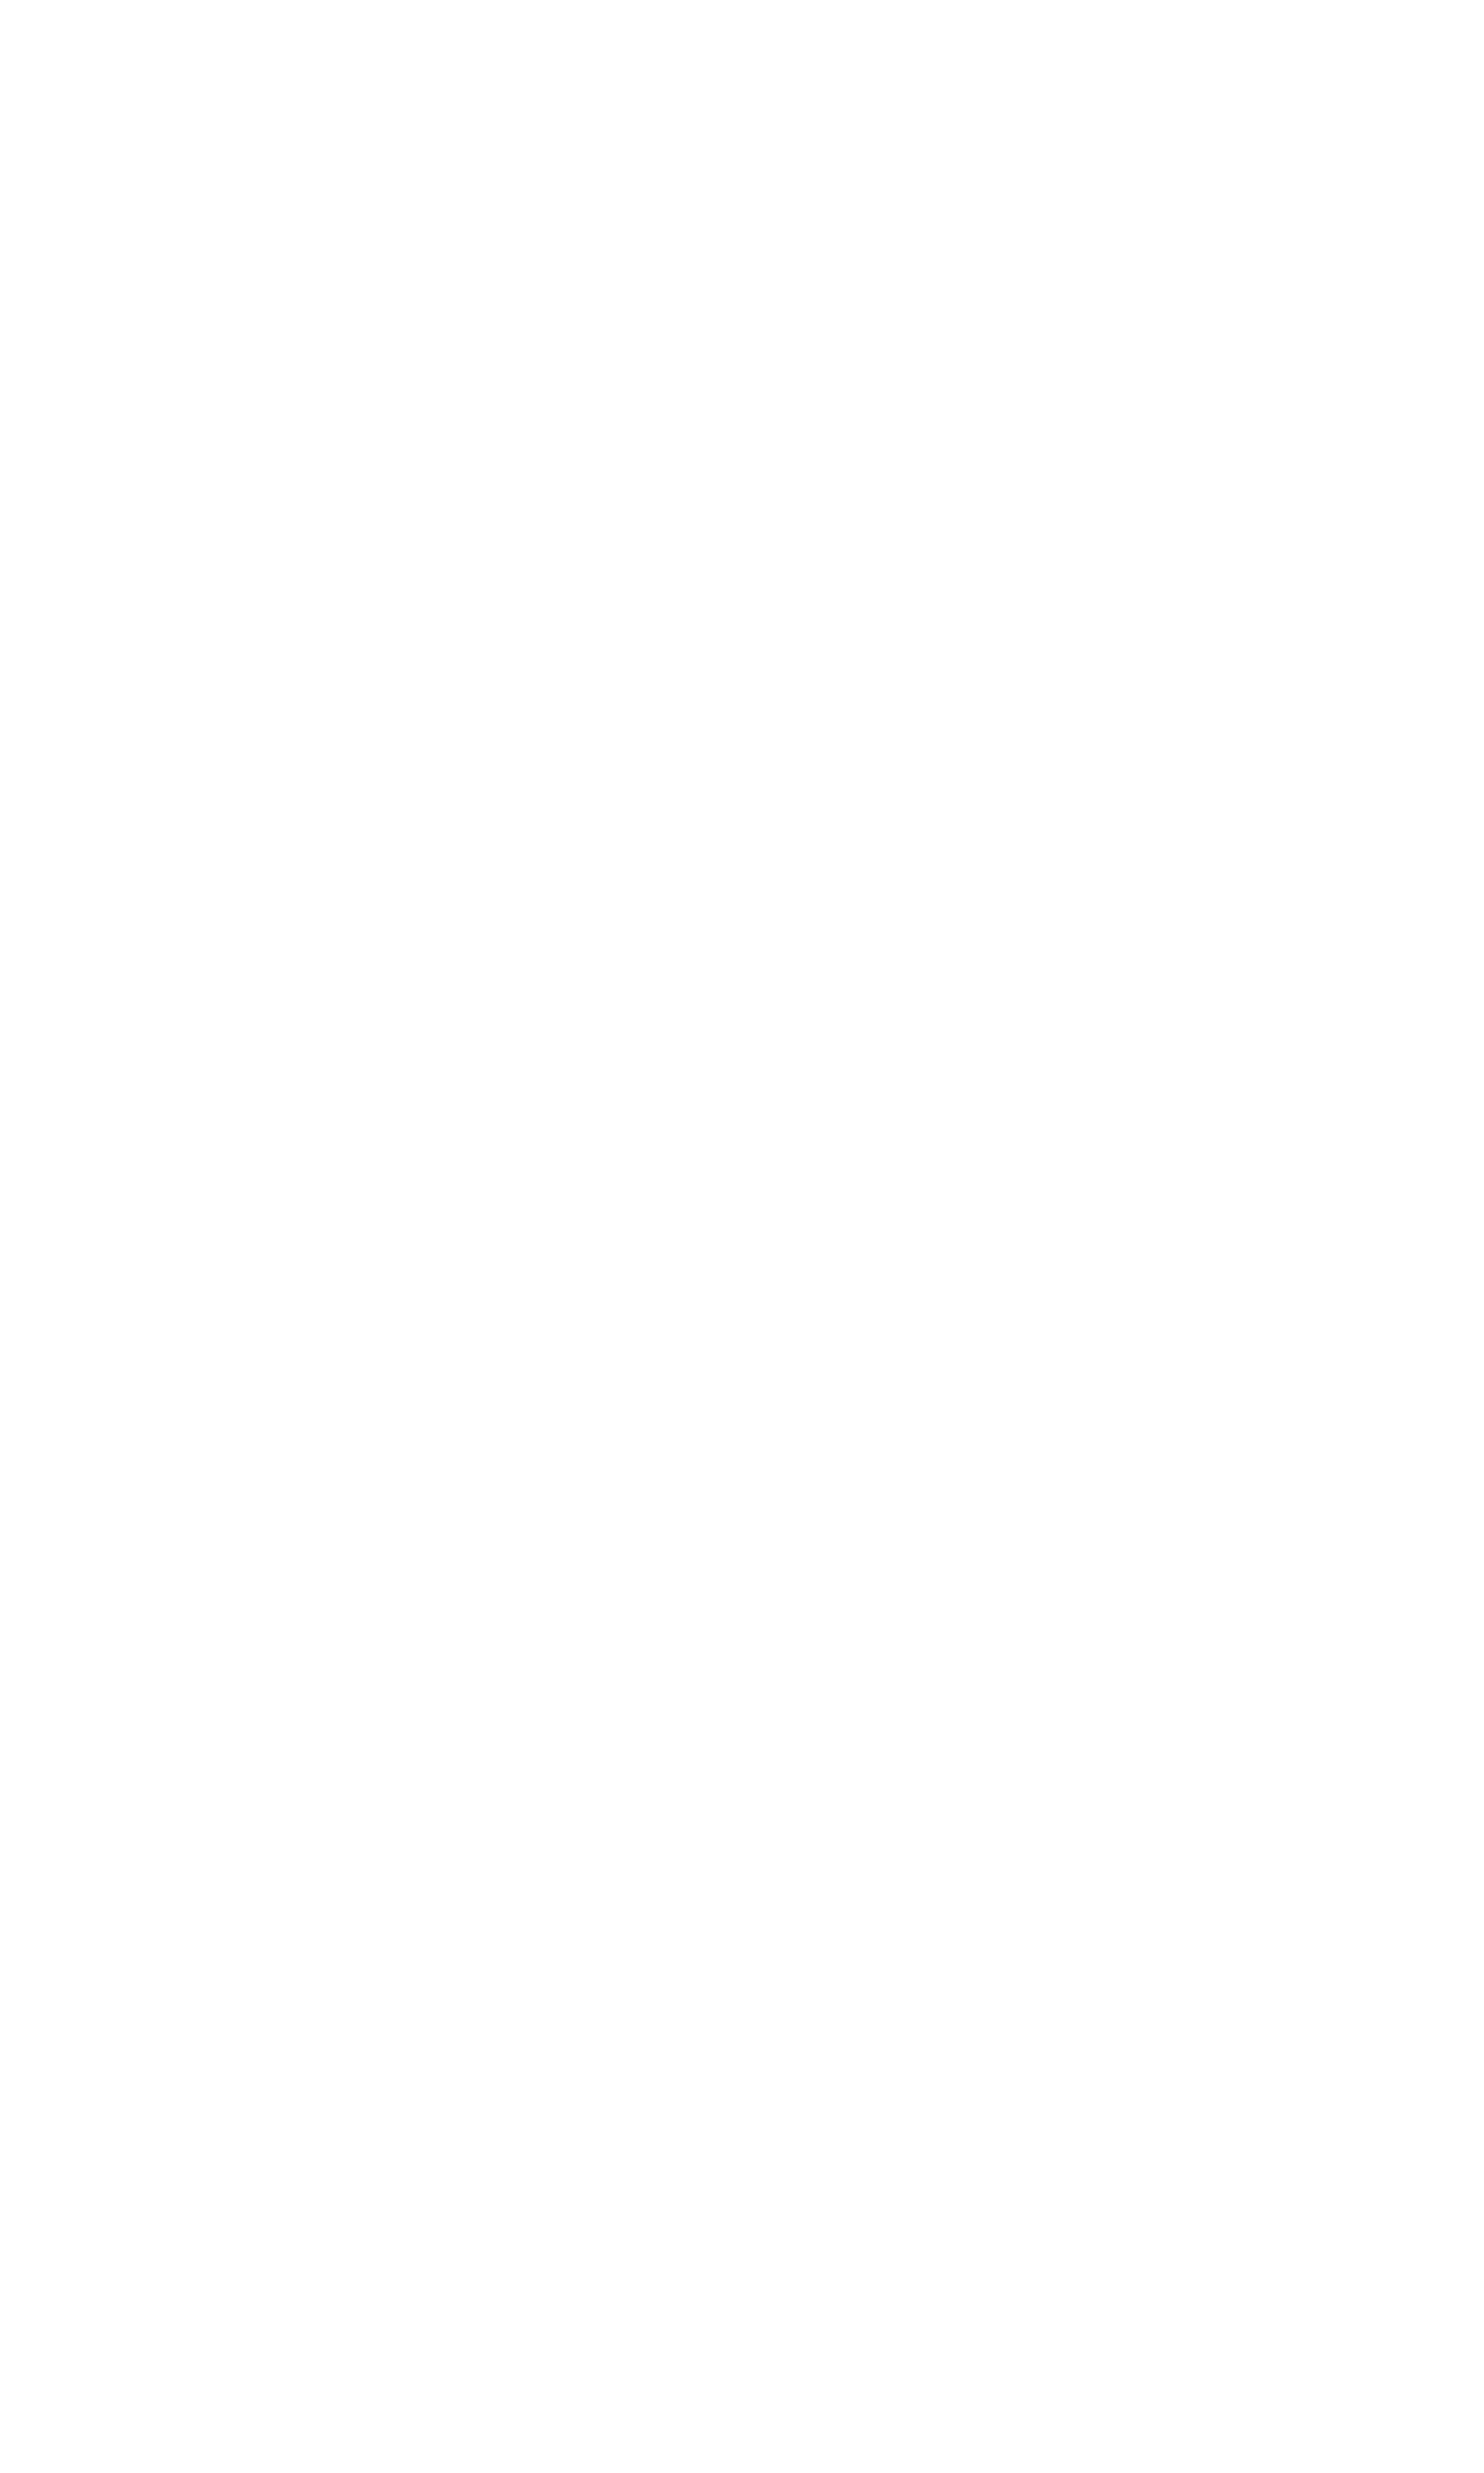 Masterbuilt Adventure Series 40-inch Digital Electric Smoker with Window Schematic